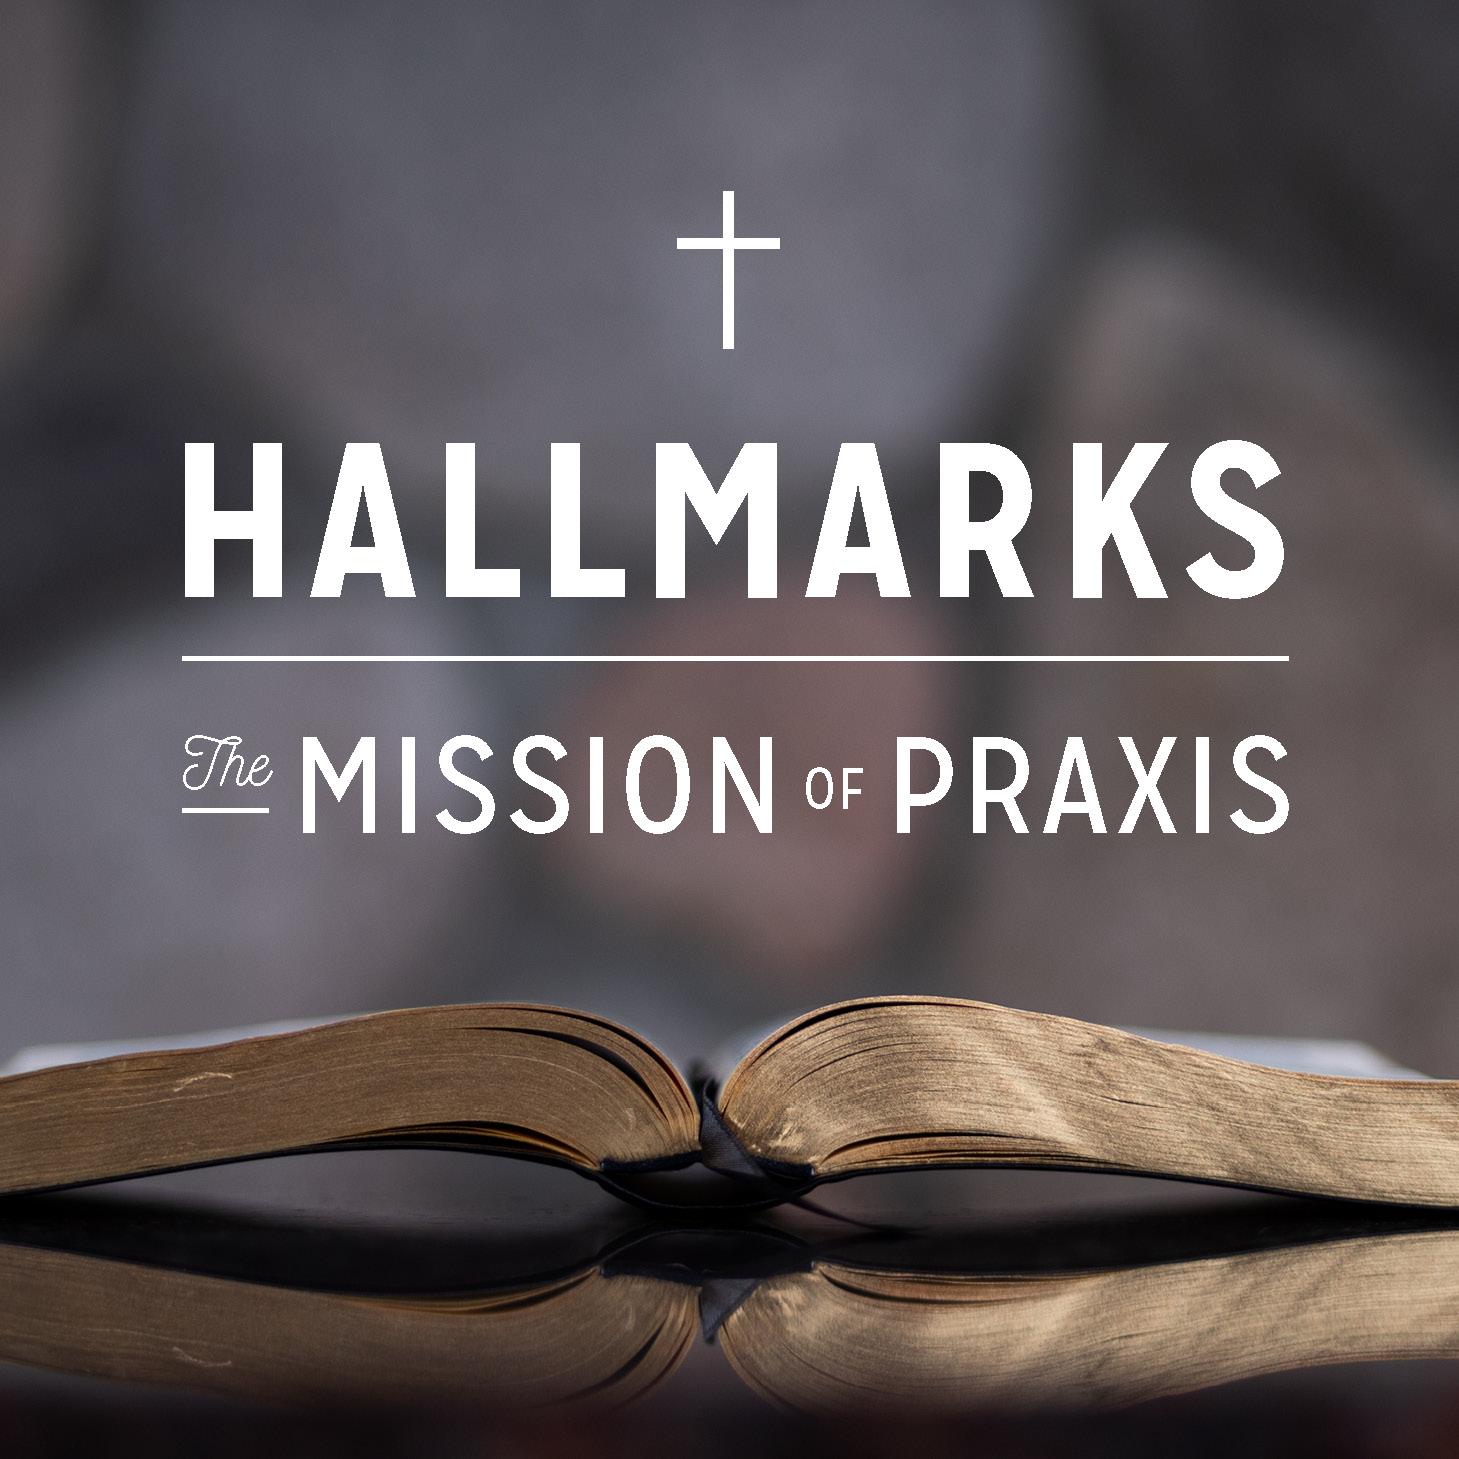 Hallmarks: Disciples Making Disciples (Matthew 4:19)